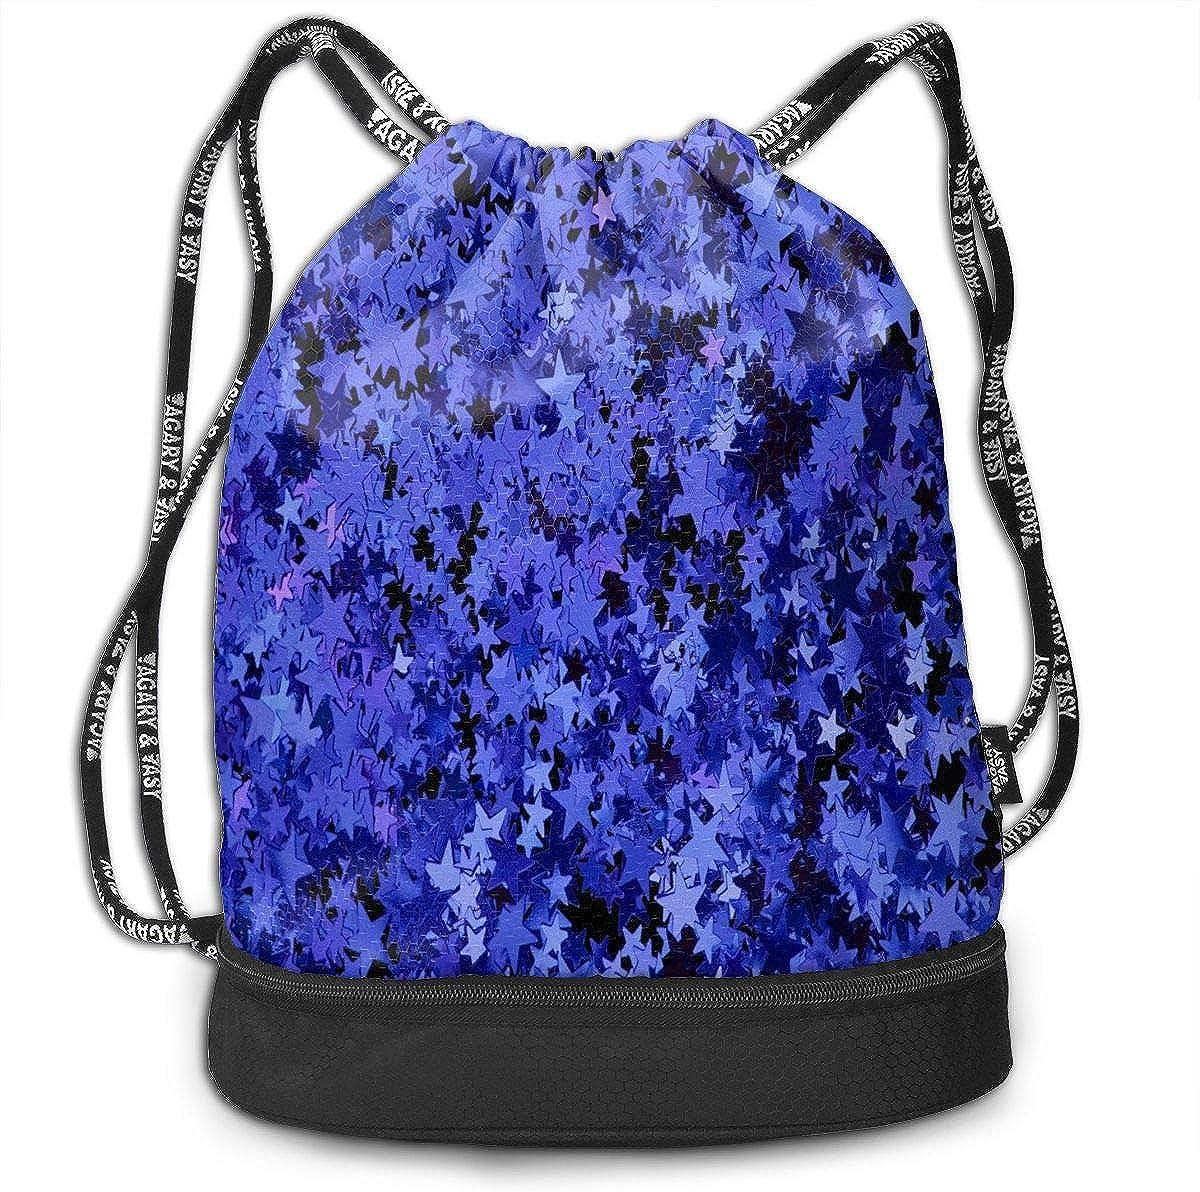 Sport Unisex Bundle Drawstring Backpack Blue Vintage Pattern Travel Durable Large Space Gym Sack Vintage Waterproof